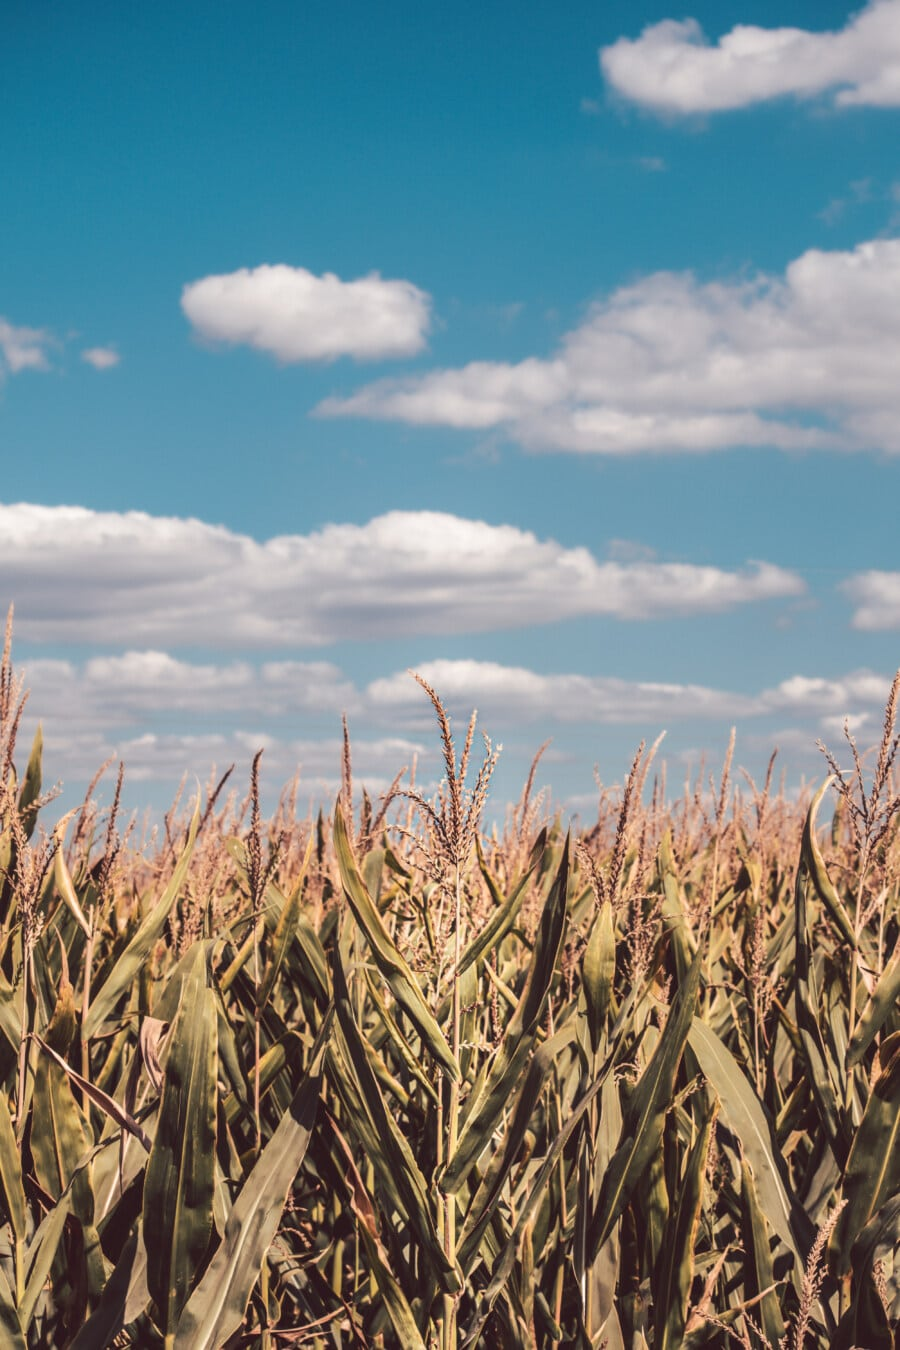 cornfield, corn, agricultural, field, agriculture, farmland, farming, farm, rural, cereal